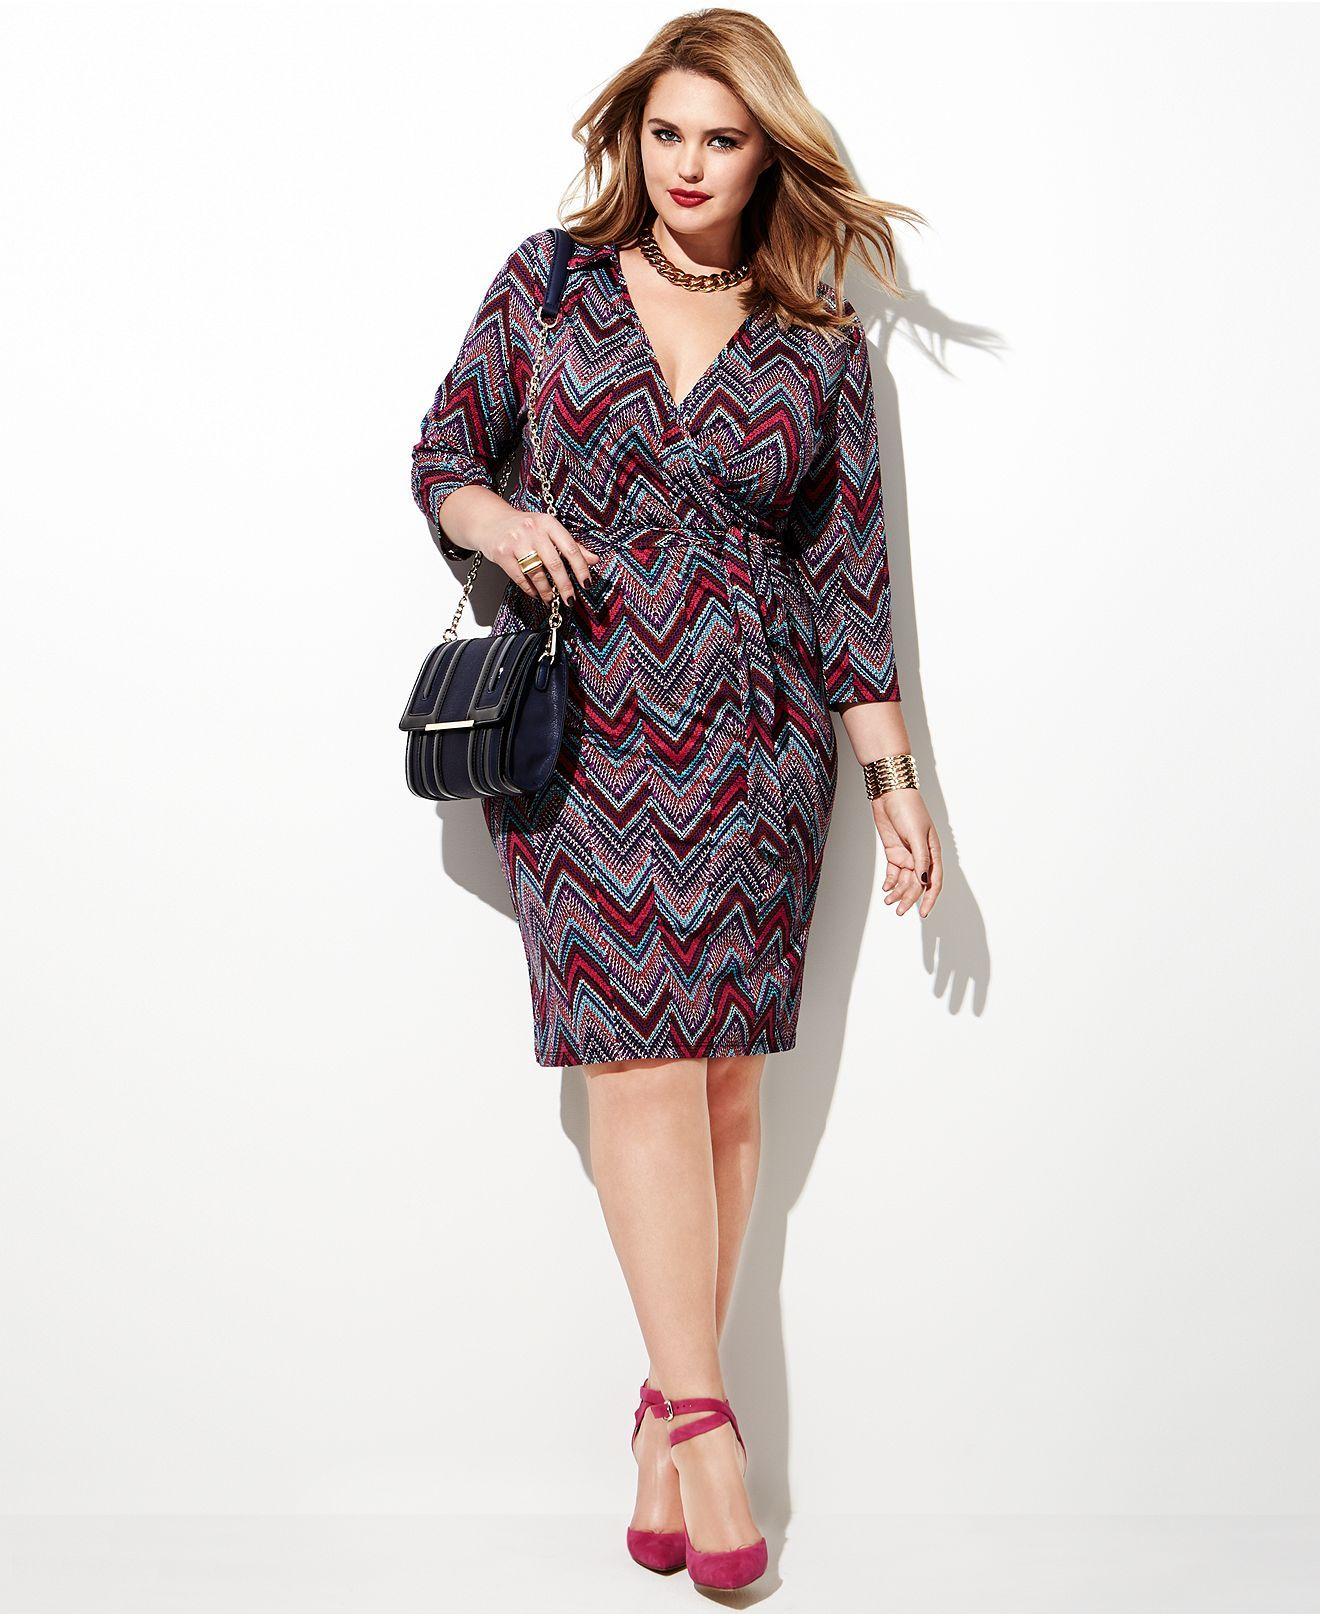 Plus Size Fall Fashion Trend Report Printed Dresses Chevron Wrap